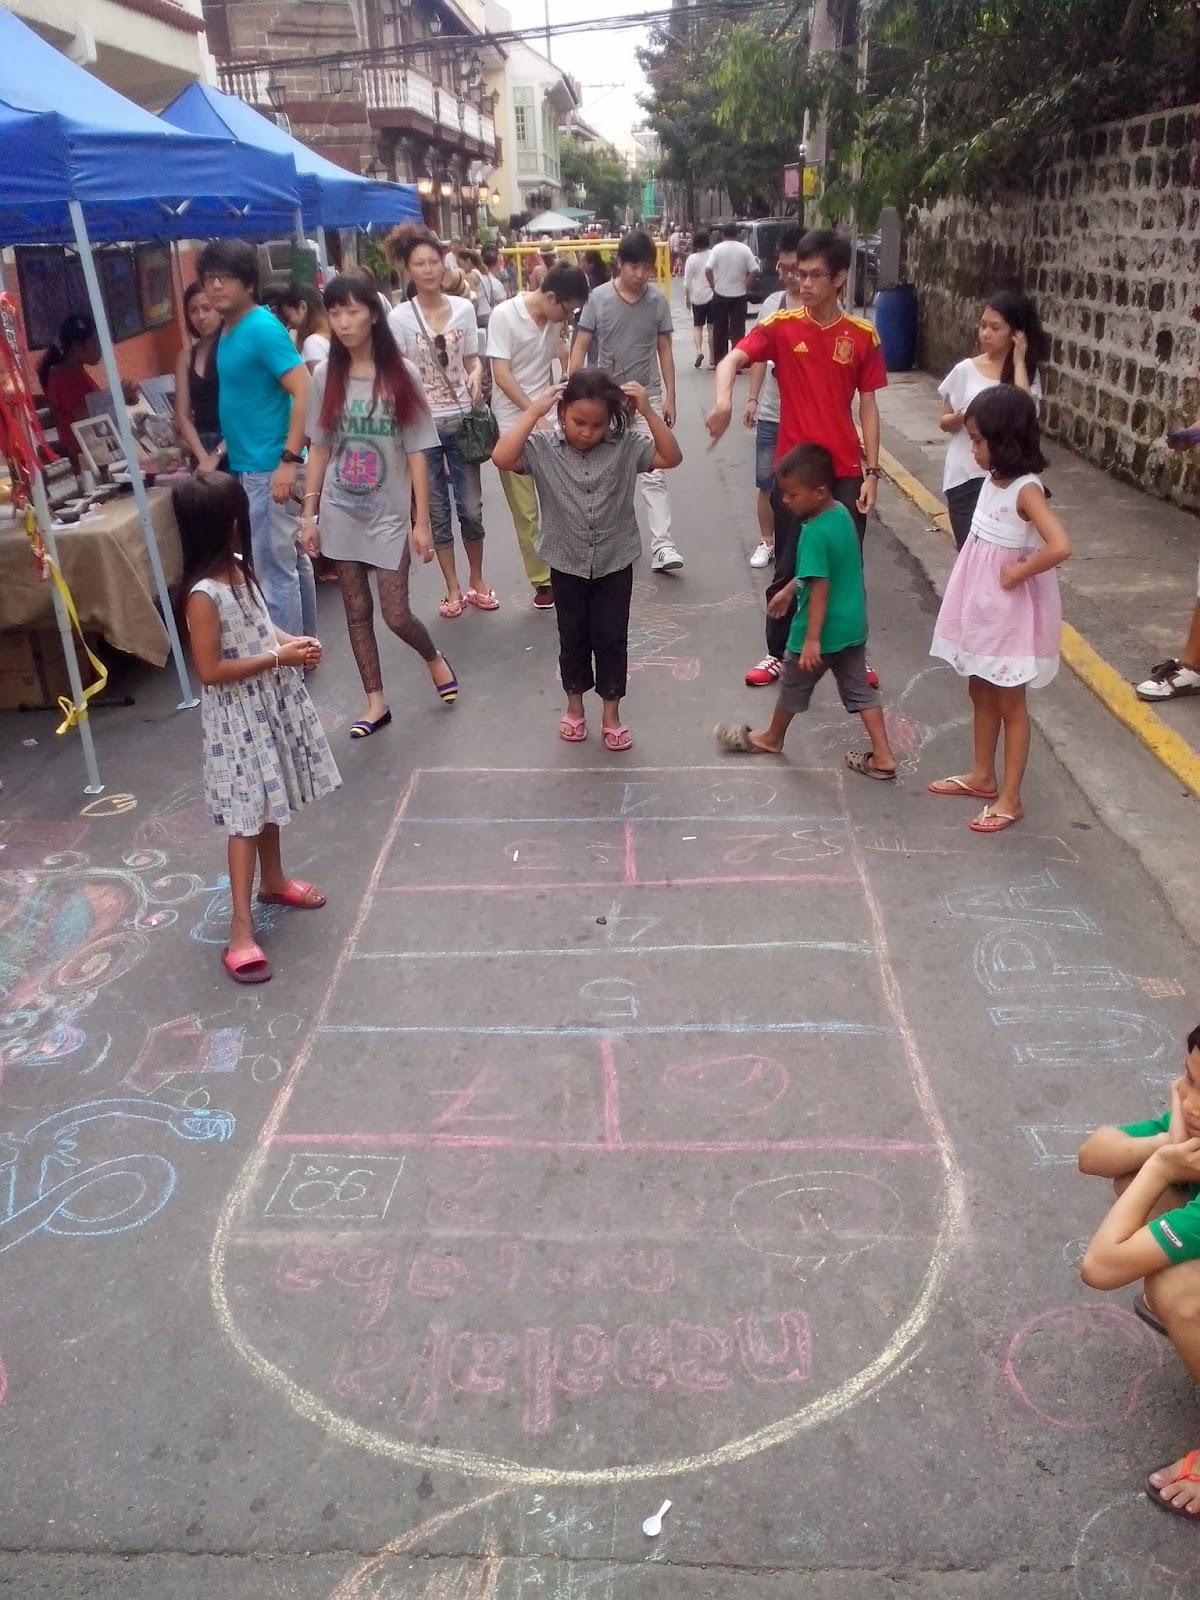 http://galaero-escapetravels.blogspot.com/2013/10/certified-batang-90s.html